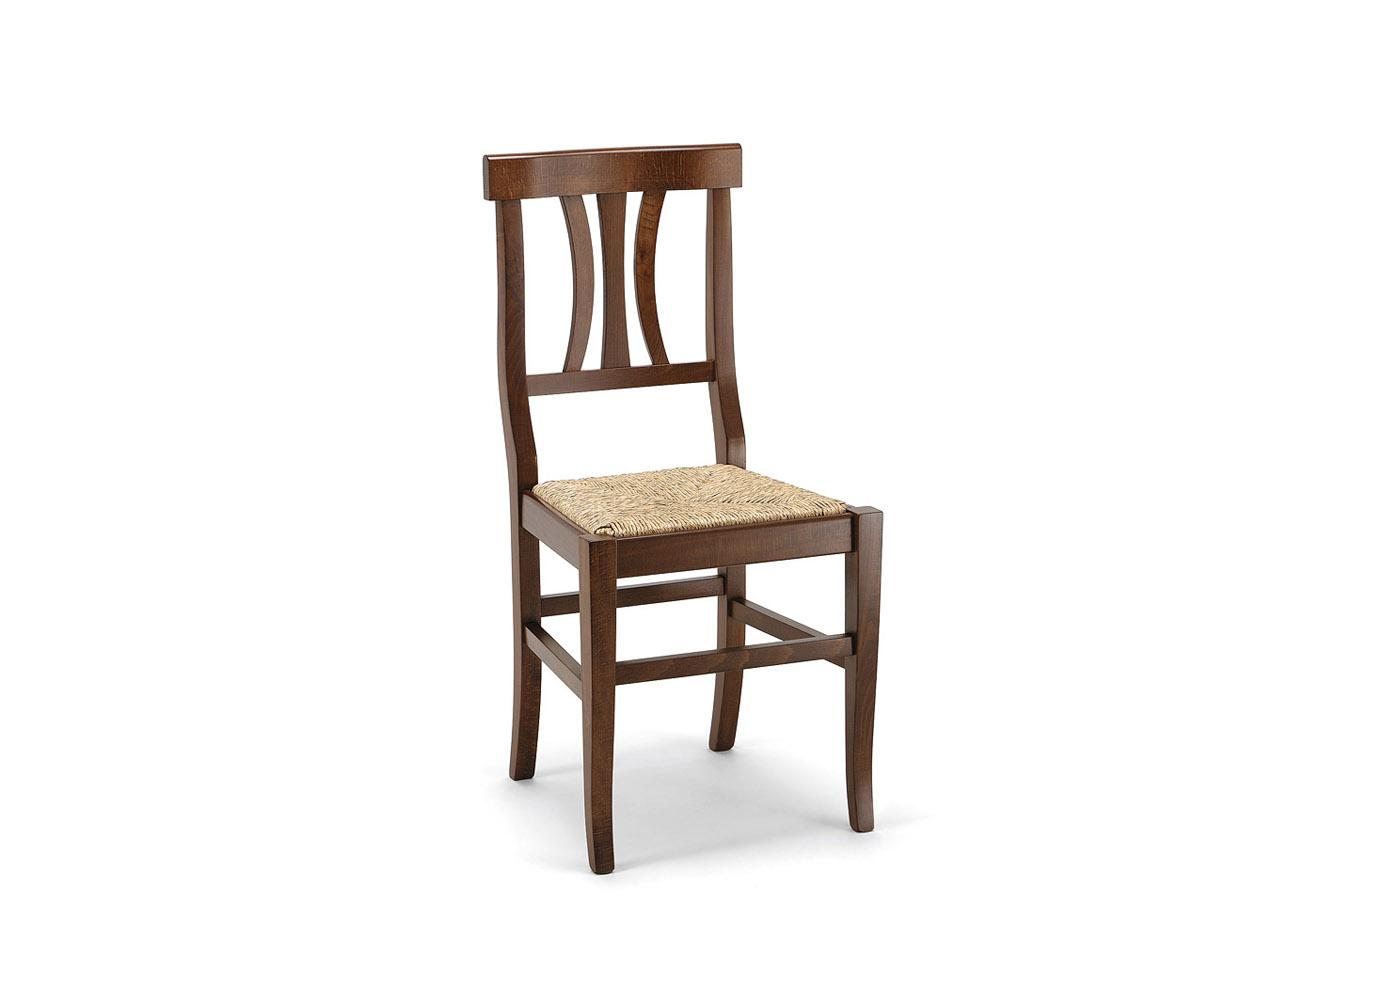 Vesarreda classico for Feltrini antirumore per sedie